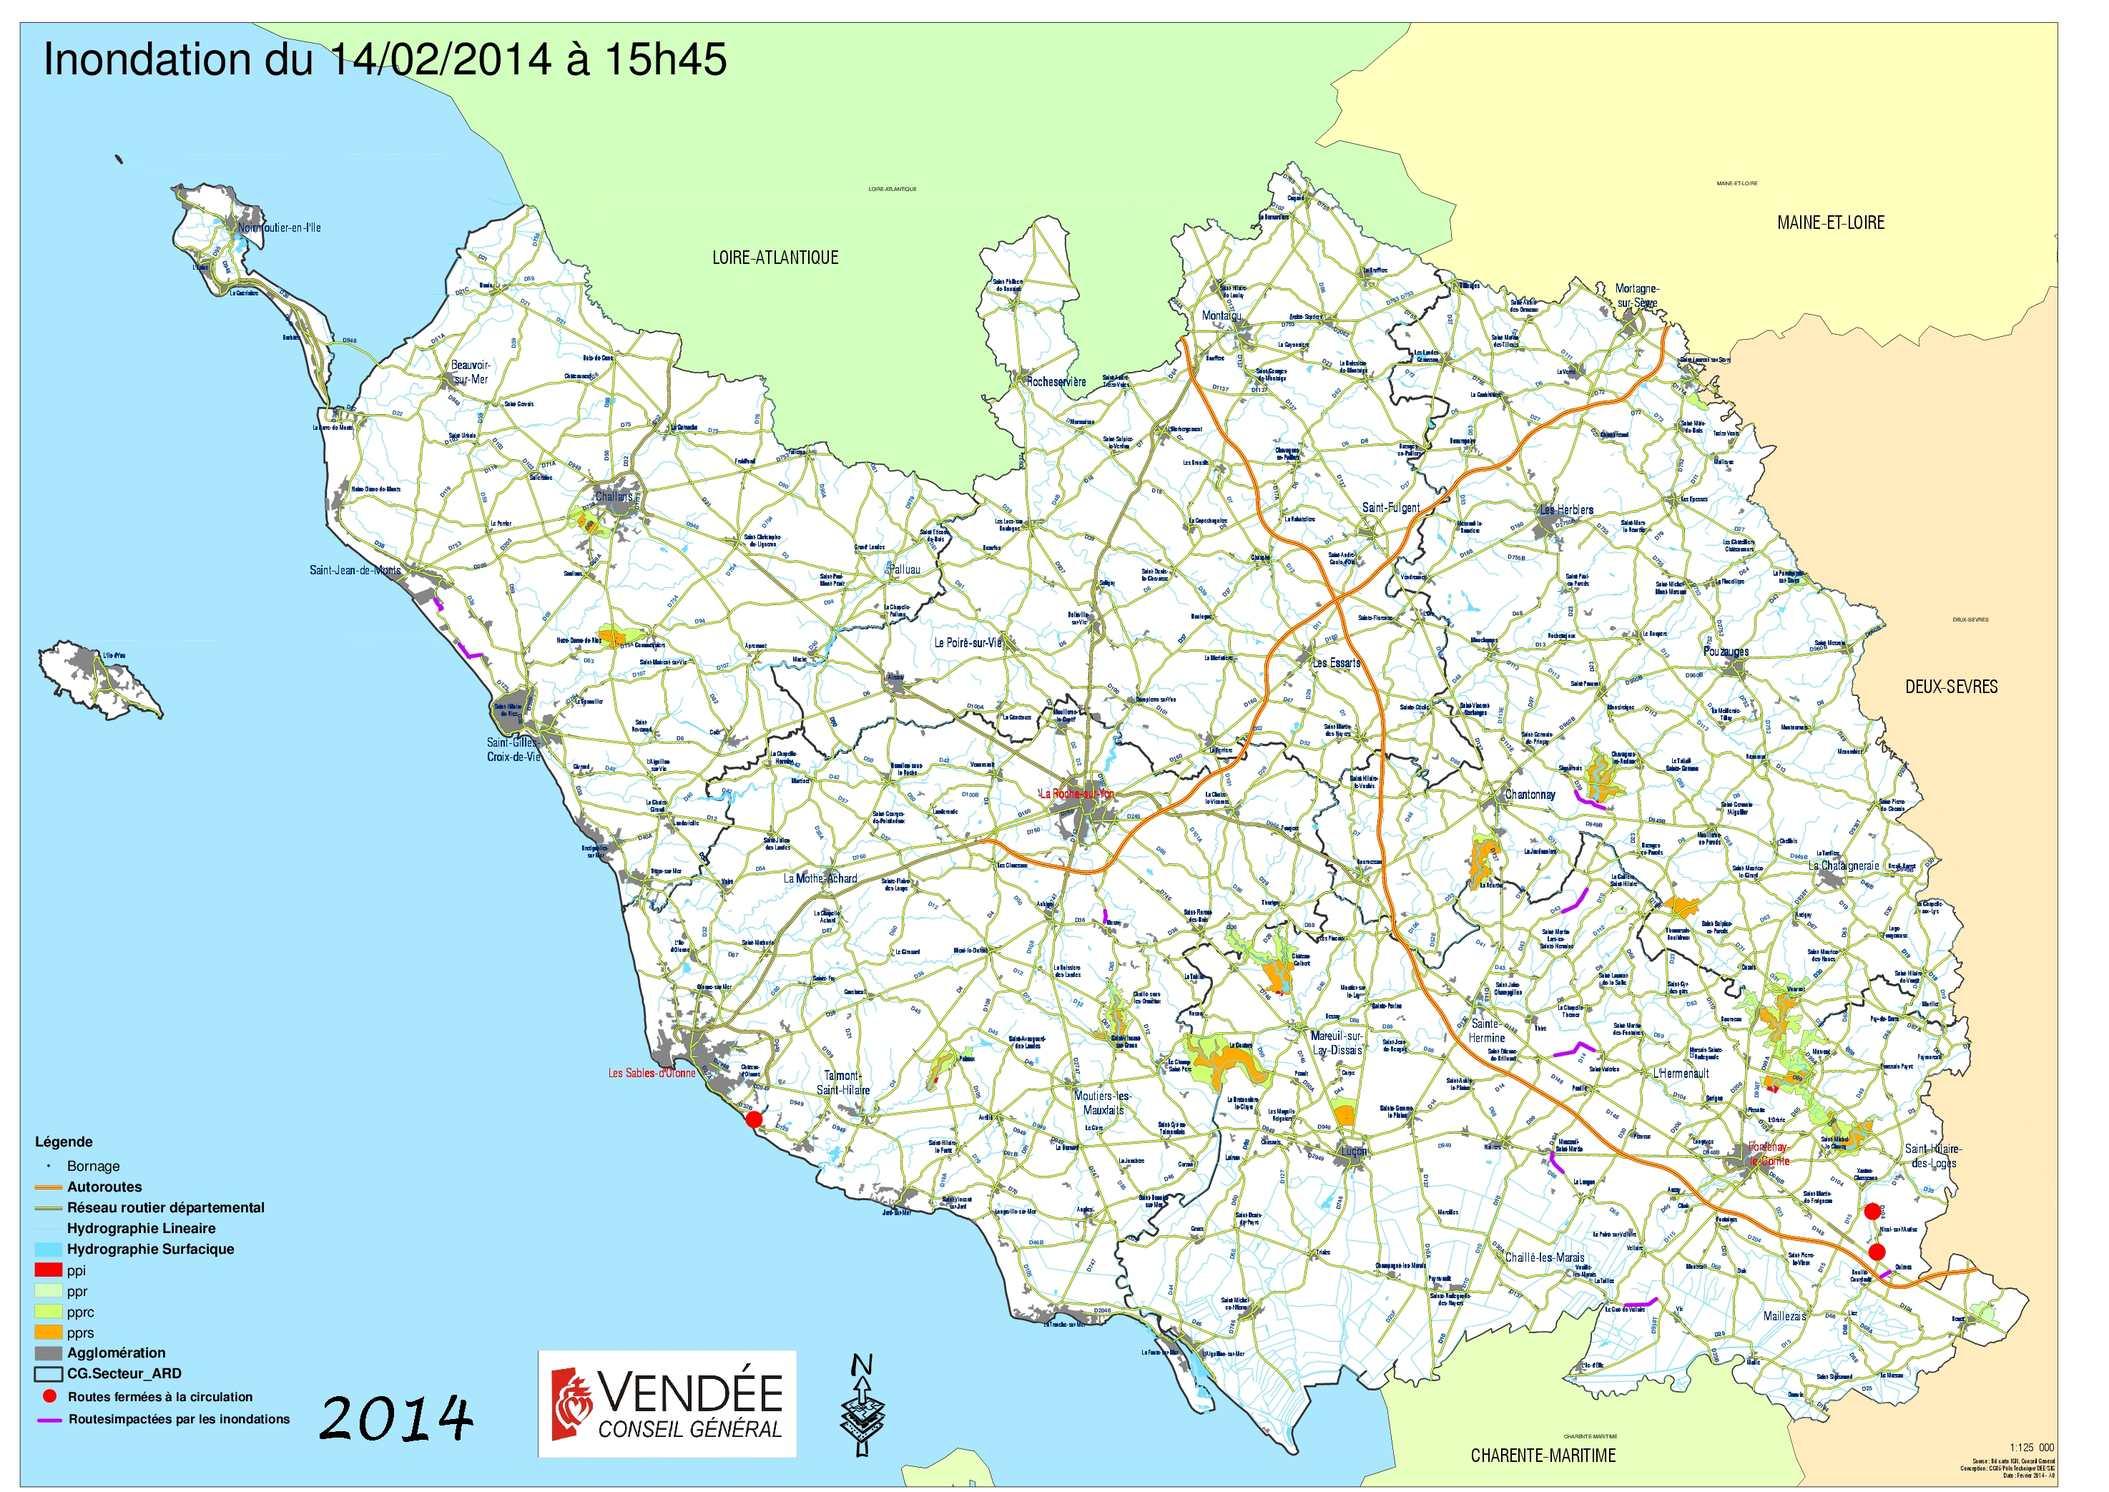 Carte Vendee Routiere.Calameo Inondations Carte Reseau Routier Vendee 13 02 2014